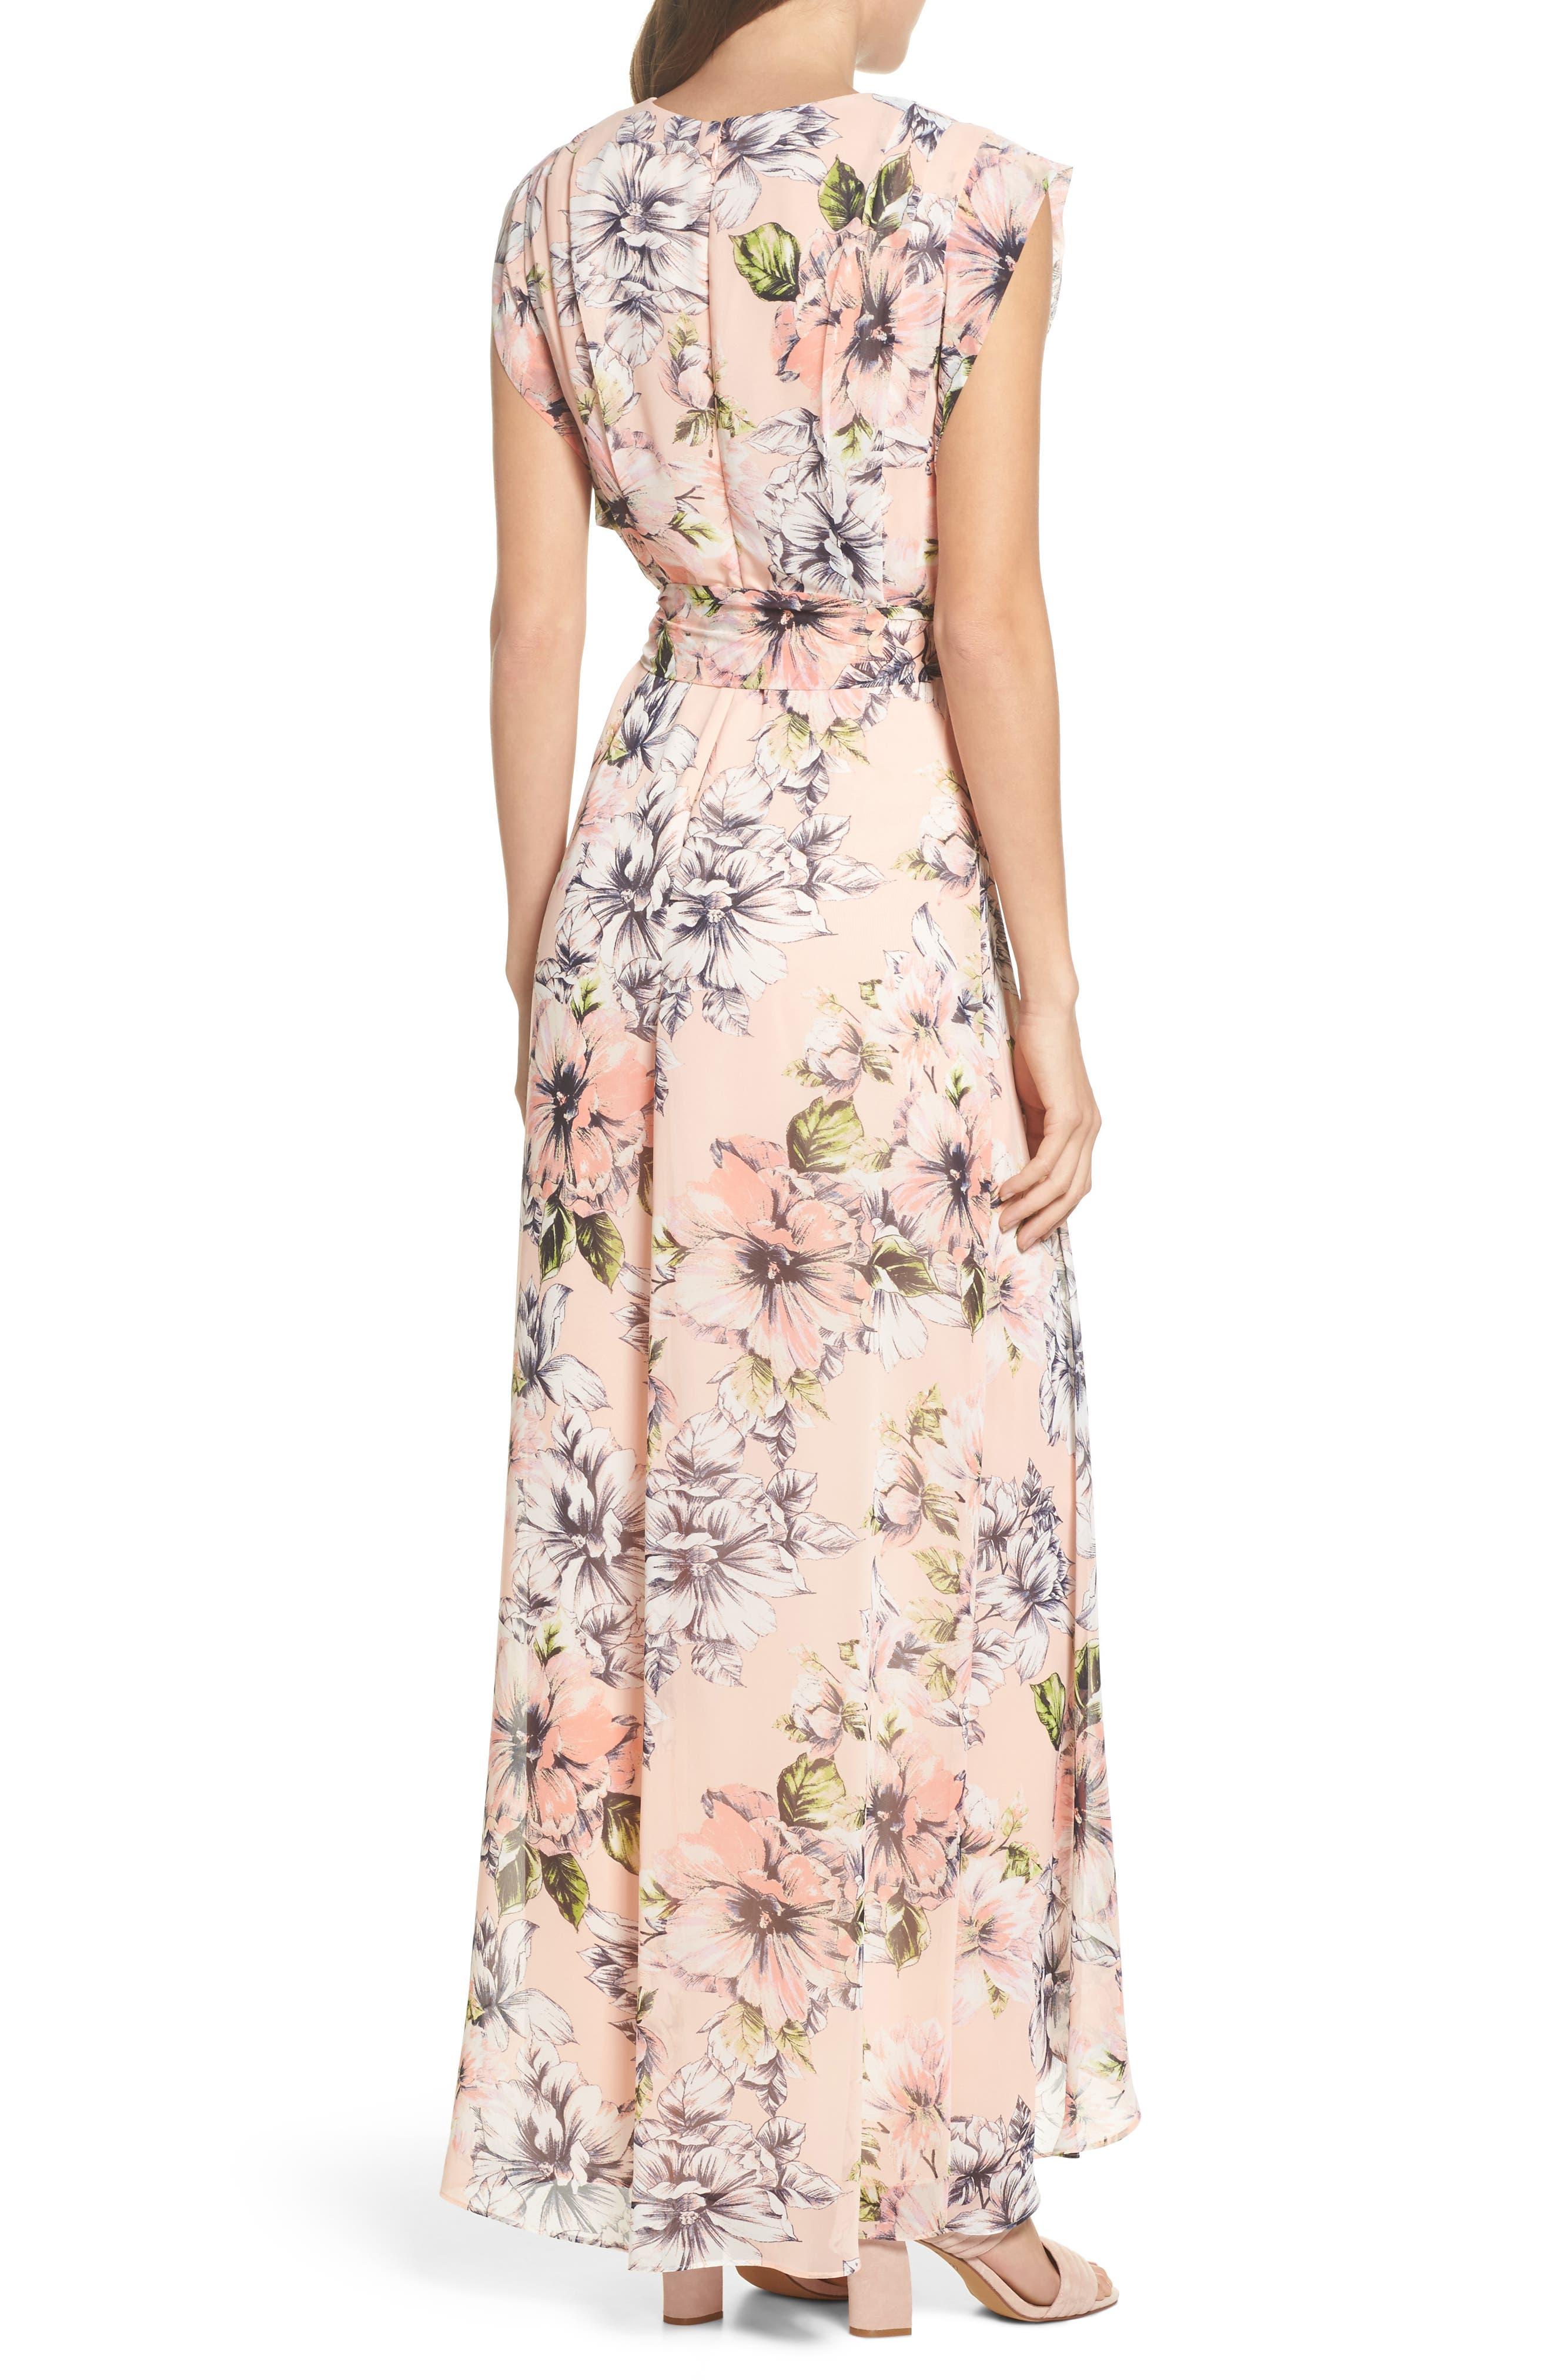 ELIZA J, Floral Ruffle High/Low Maxi Dress, Alternate thumbnail 2, color, BLUSH